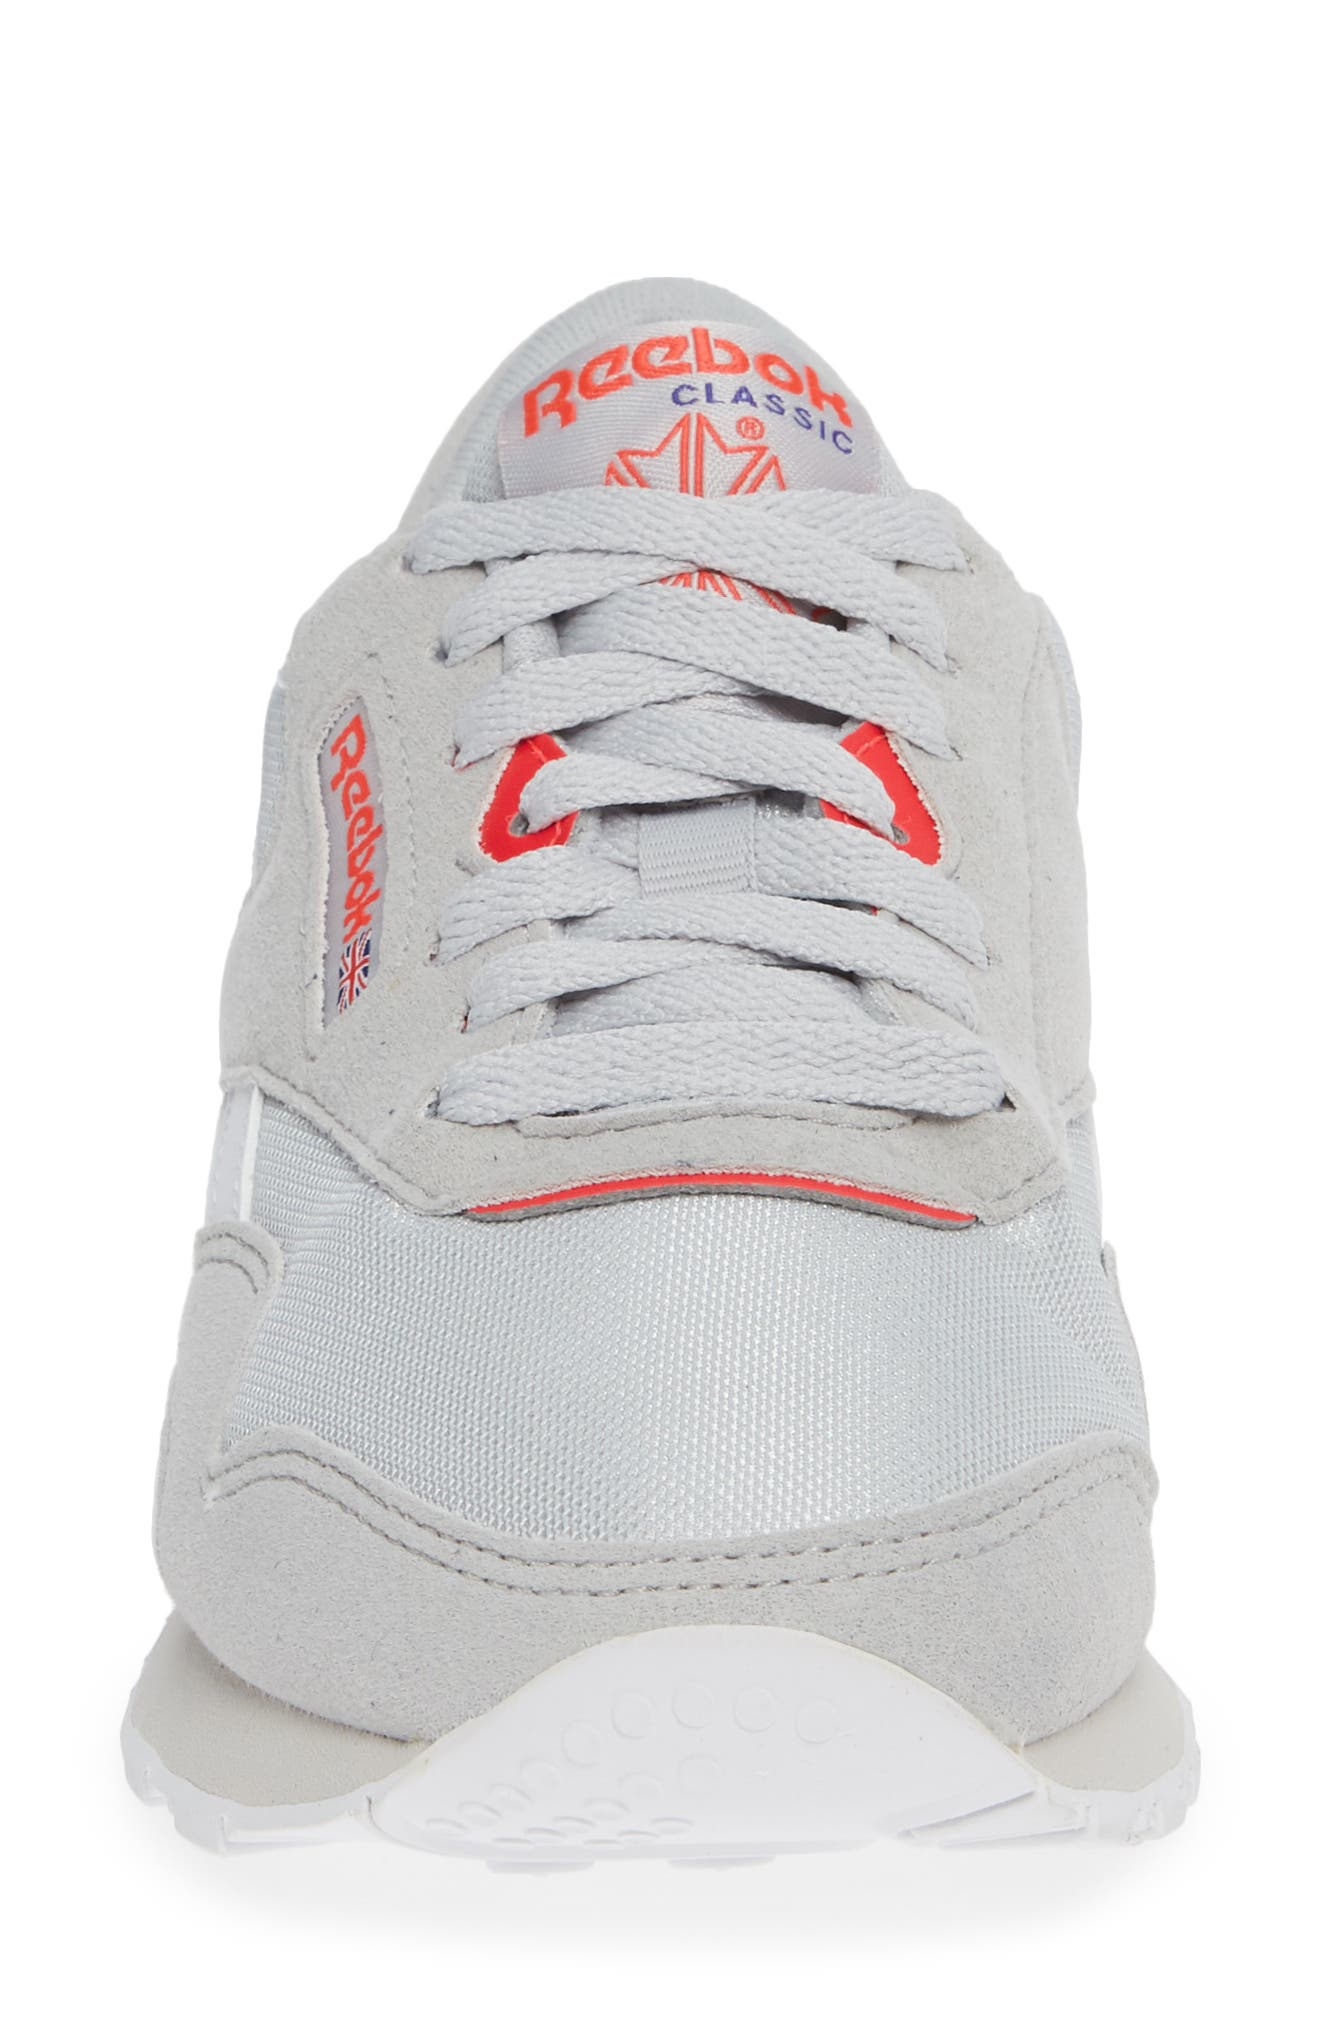 Classic Nylon TXT Sneaker,                             Alternate thumbnail 4, color,                             GREY/ NEON CHERRY/ PURPLE